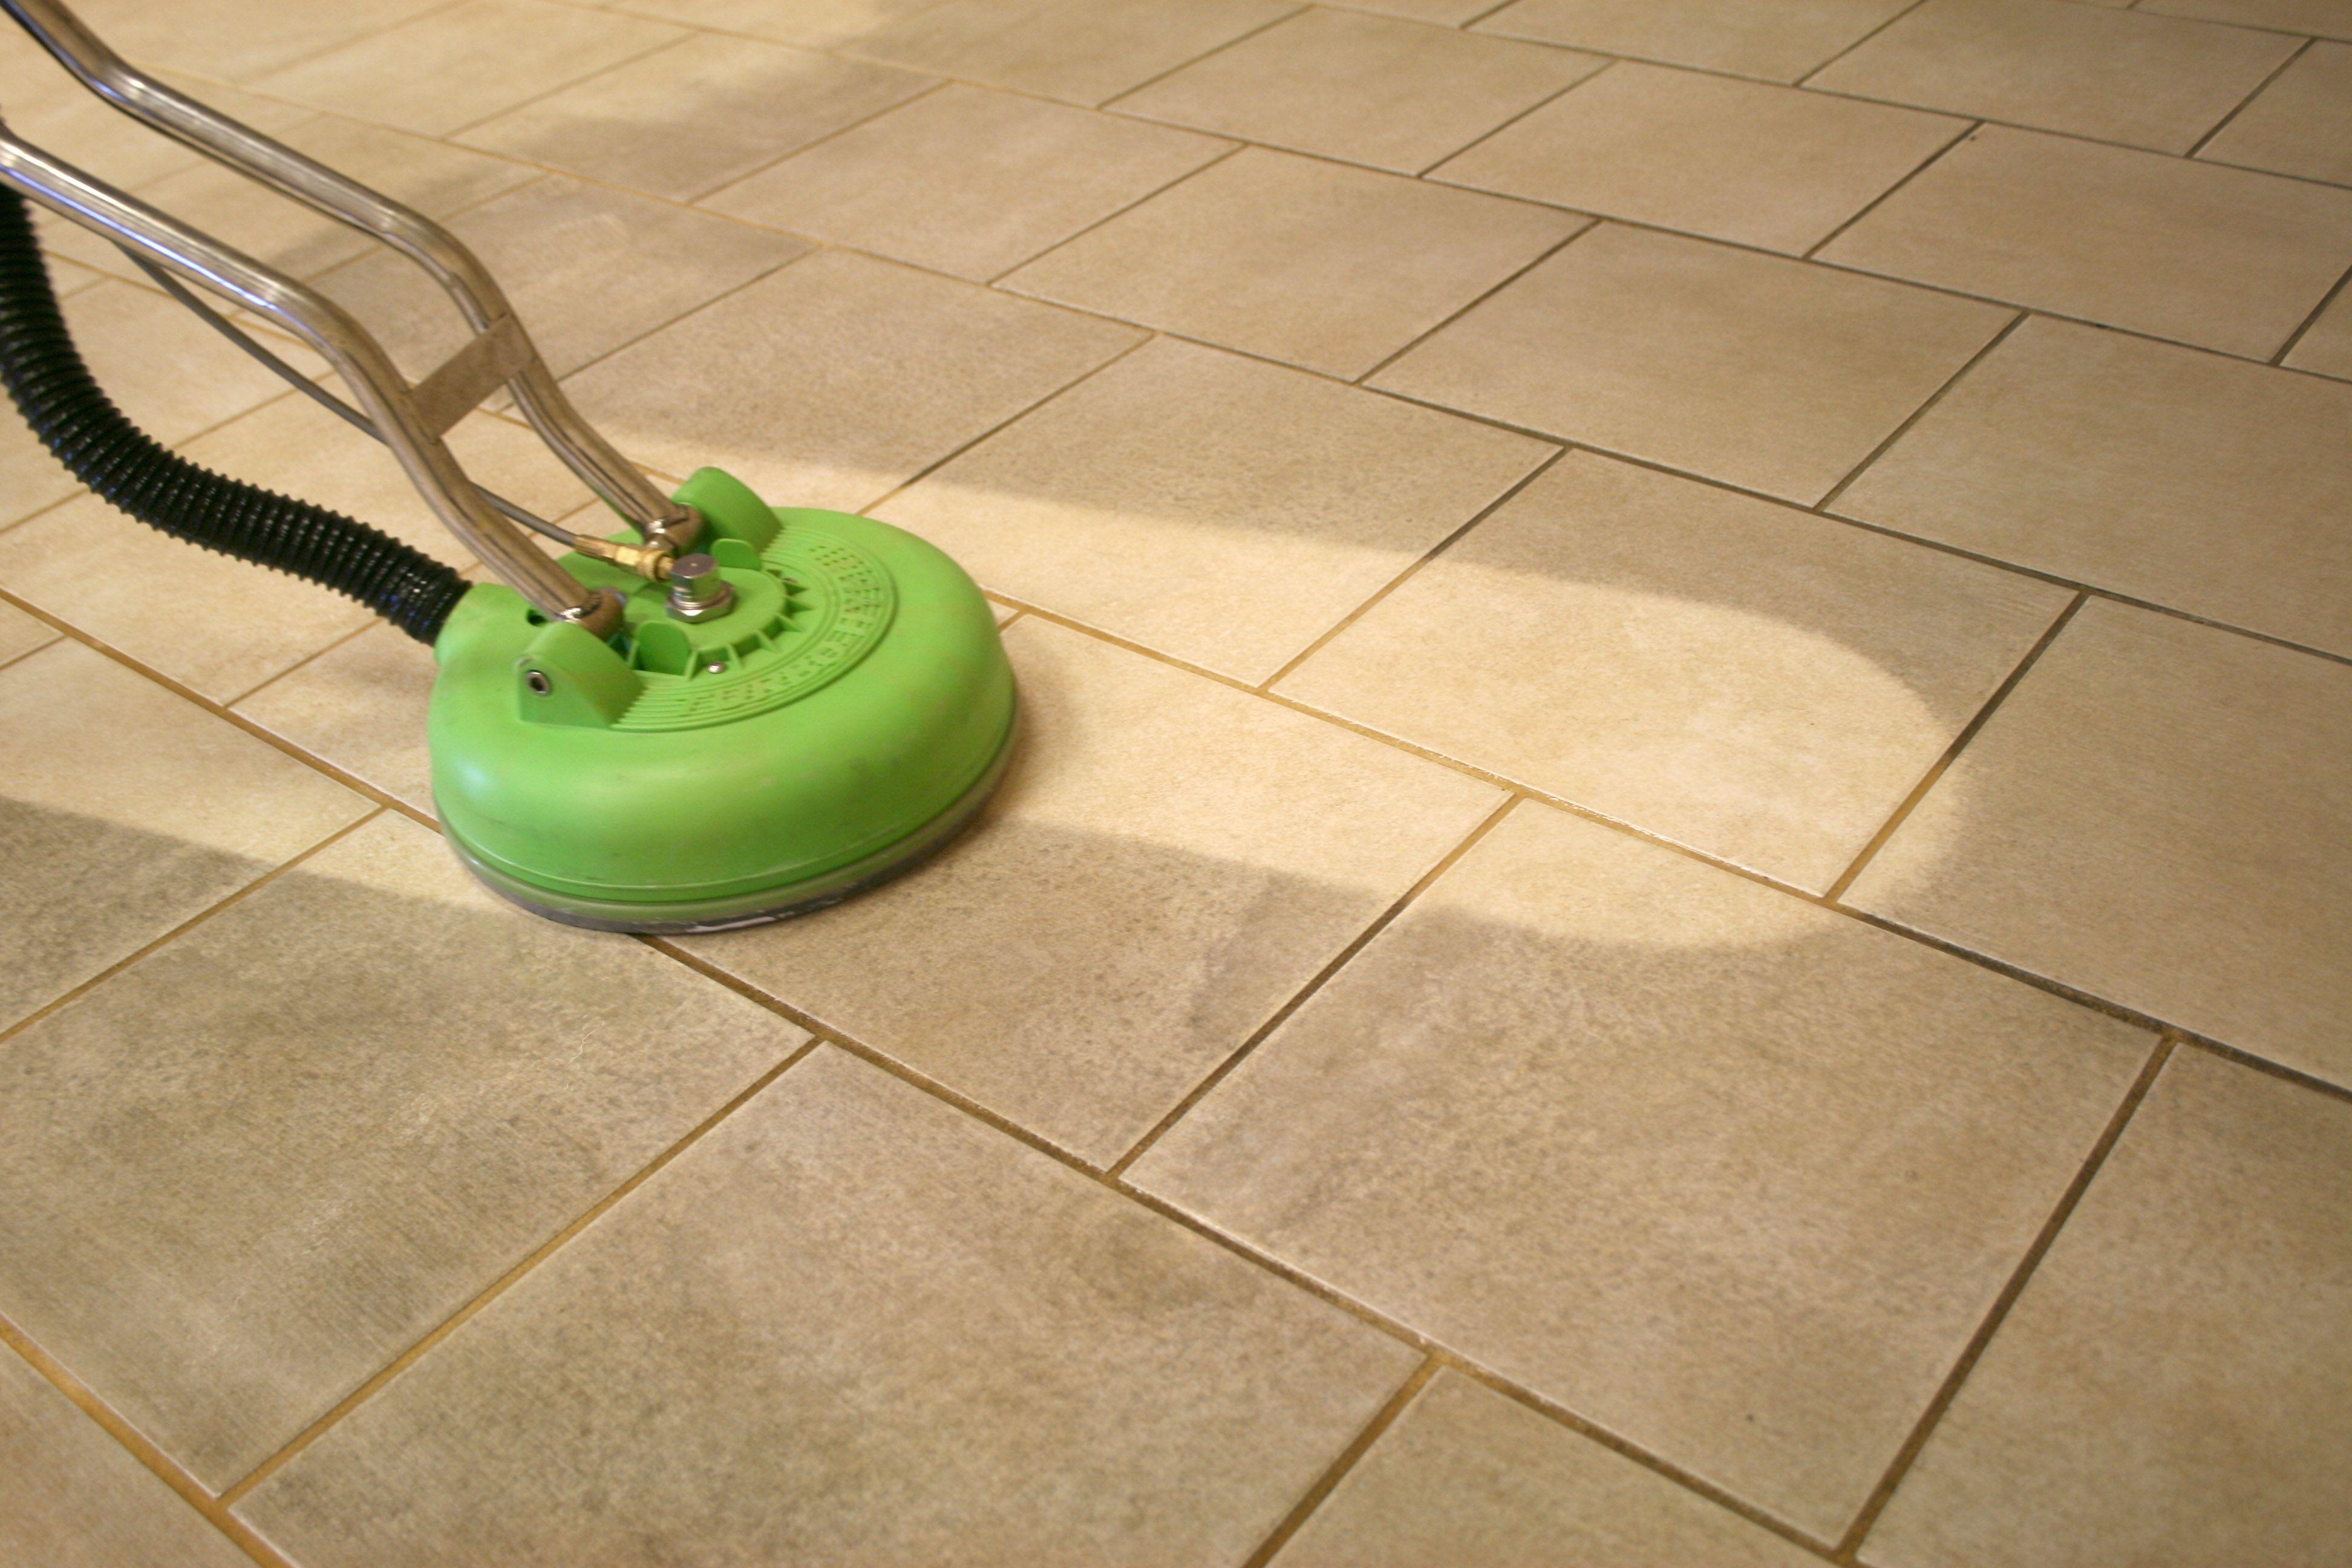 Best way to polish tile floors httpnextsoft21 pinterest best way to polish tile floors dailygadgetfo Choice Image